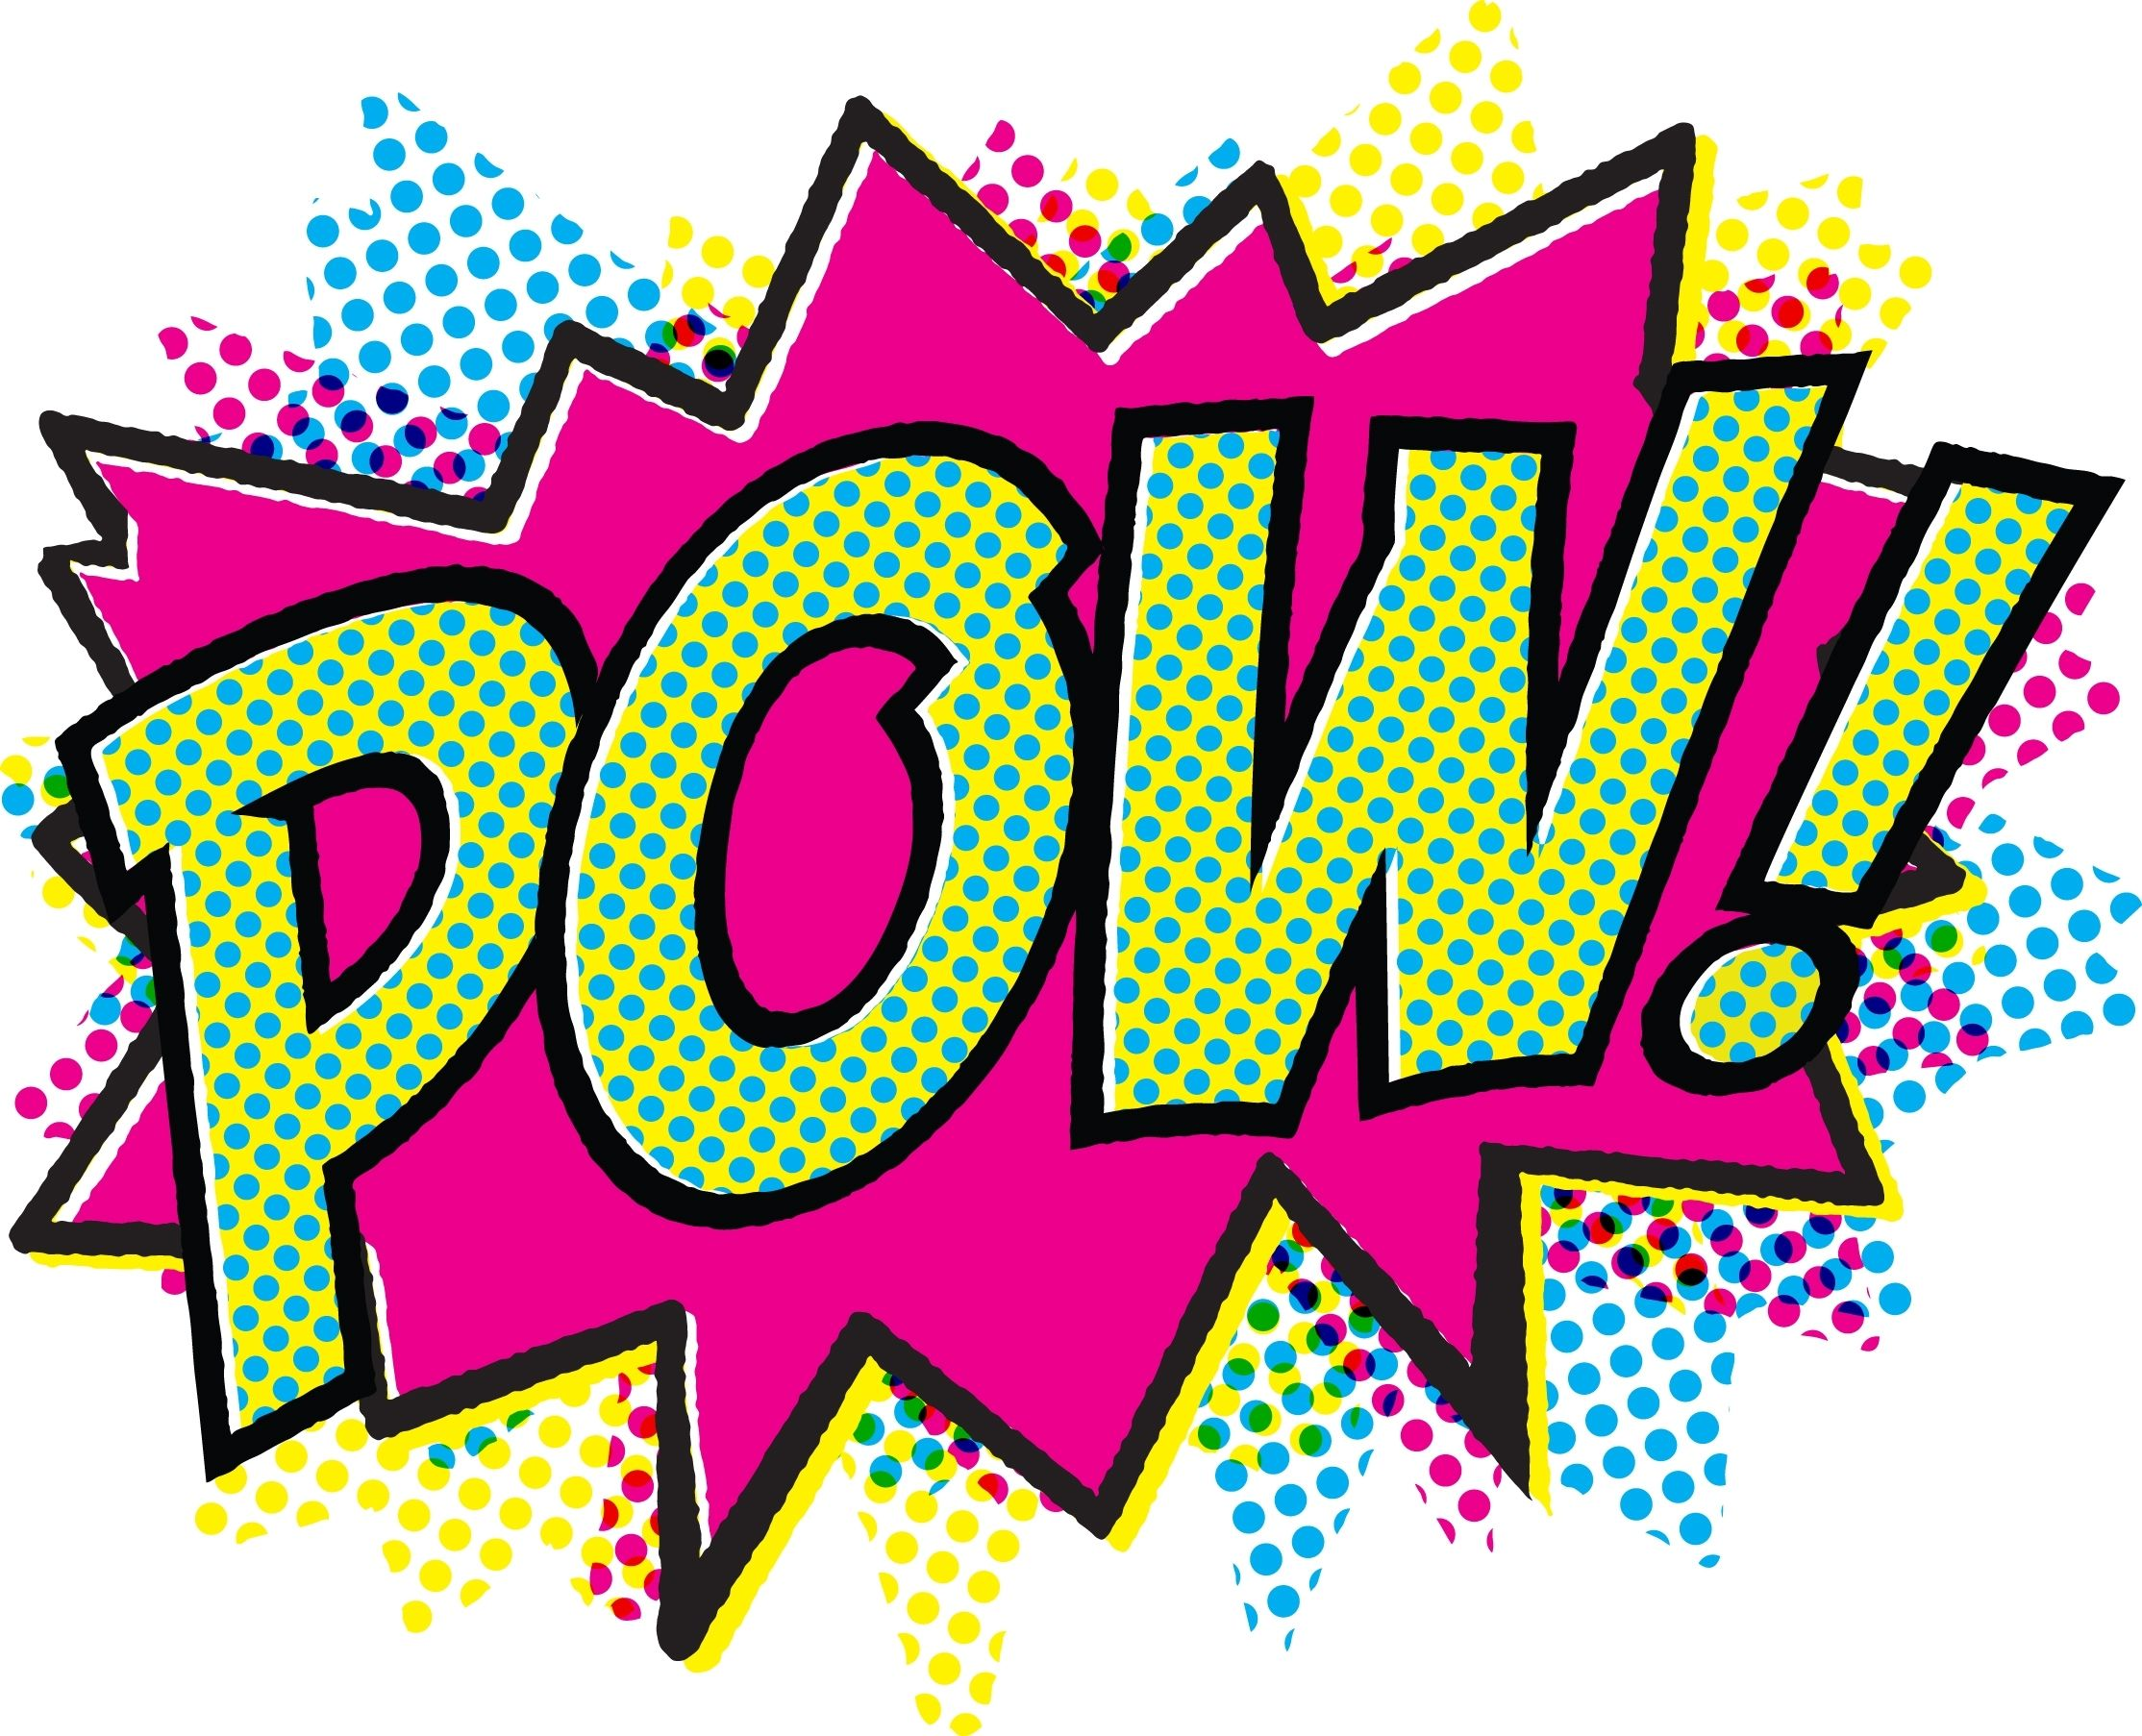 2228x1806 Retro Comic Art Pow Retro Comic Book, Lets Get This Party